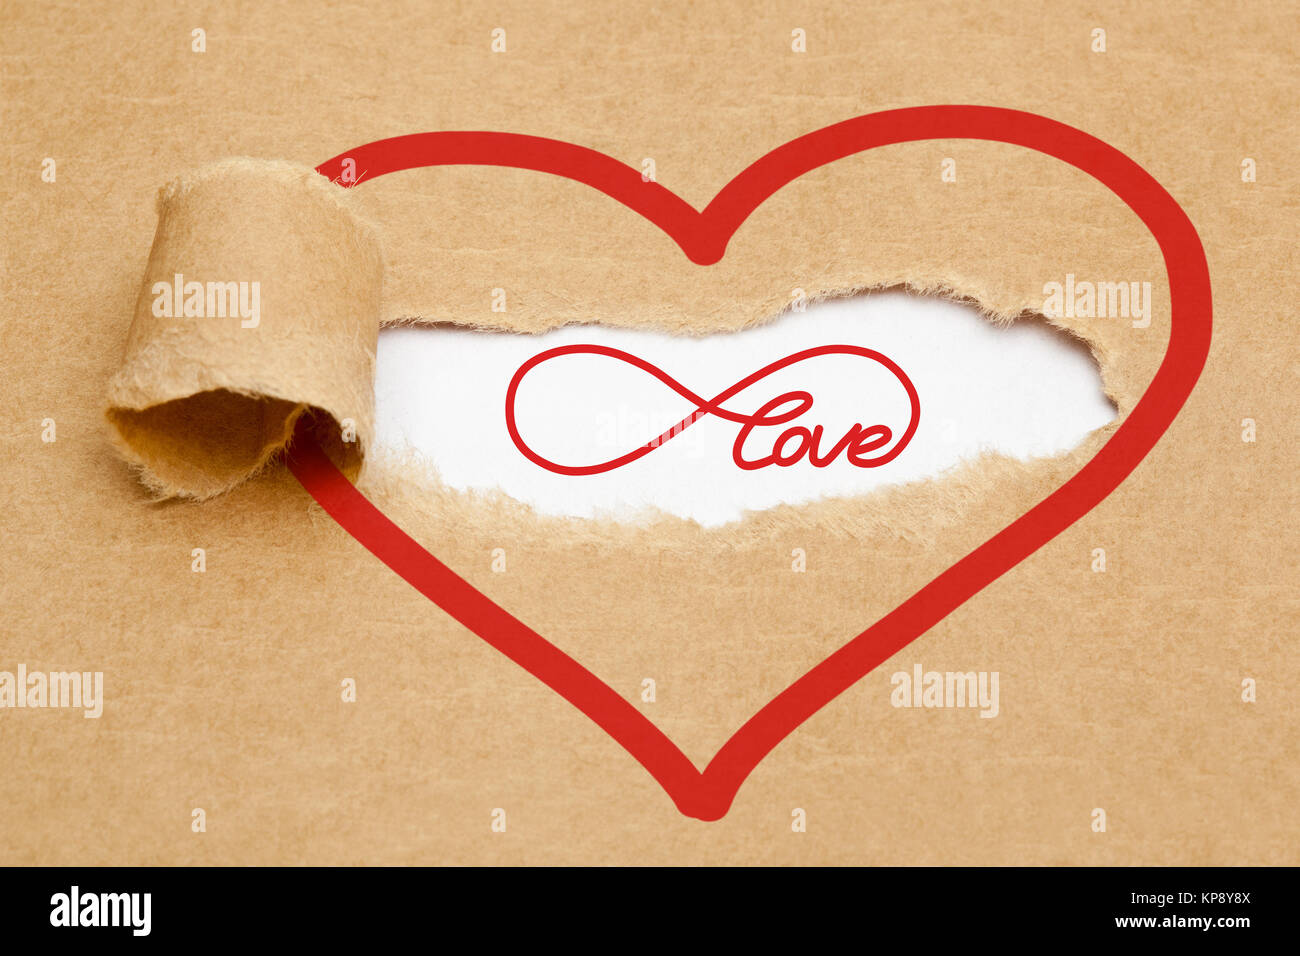 Endless Love Concept Infinity Symbol Stock Photos Endless Love